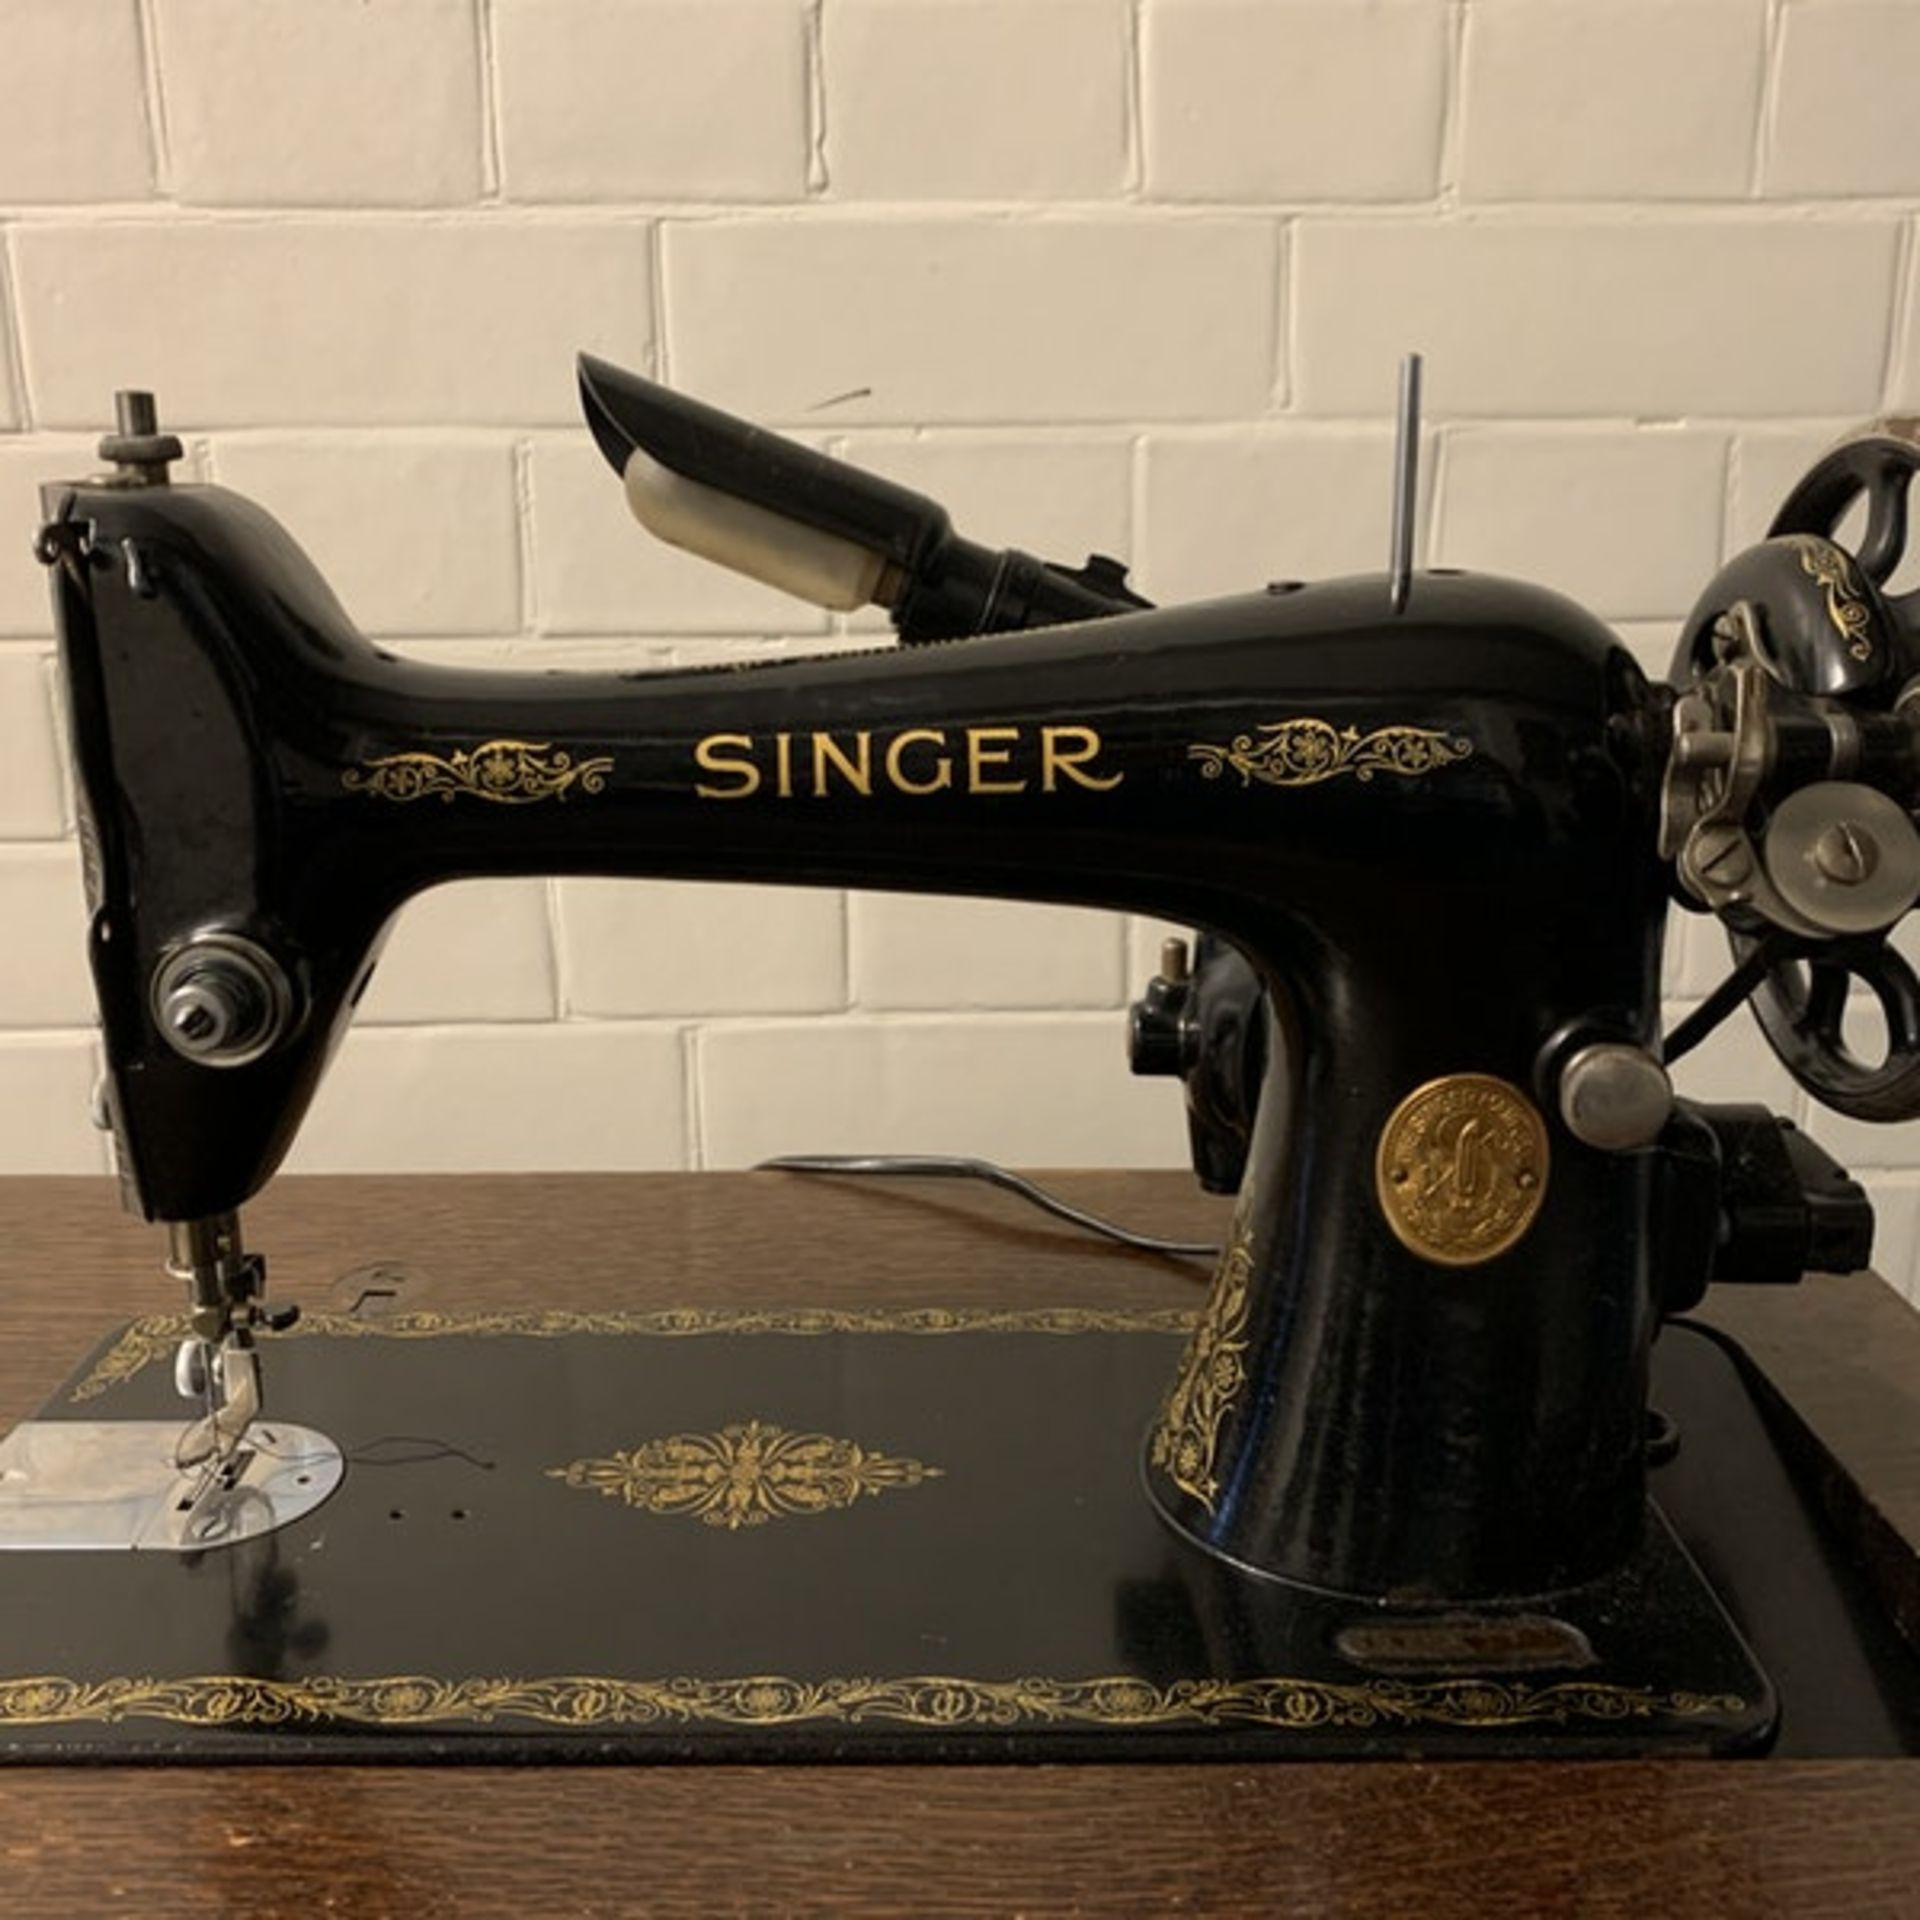 Vintage Singer 230000 sewing machine in cabinet 57 x 42 x 79 Serial Number Y8338989 YOM 1923 ( - Image 4 of 4